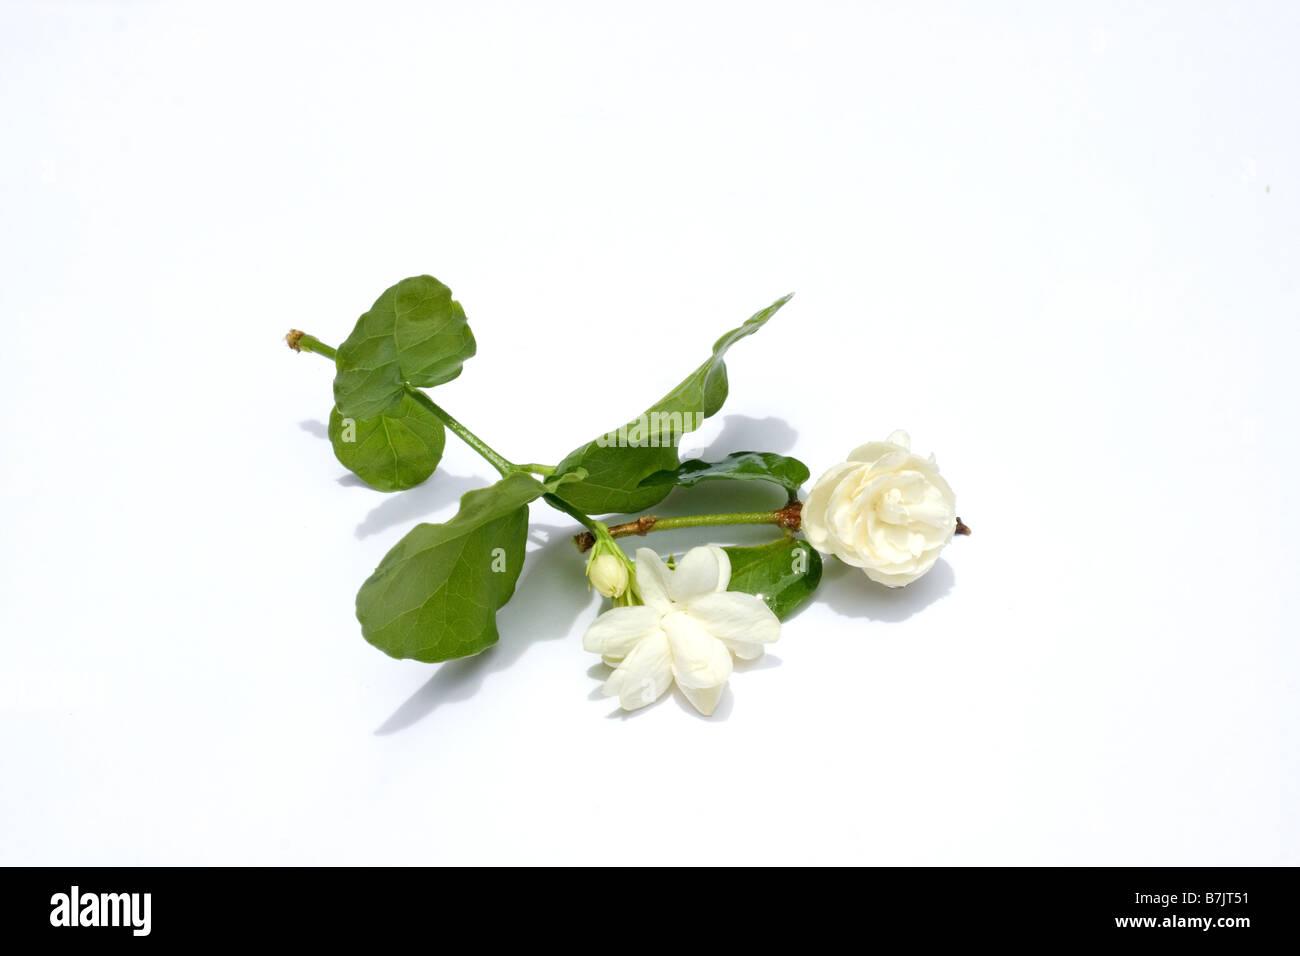 Arabian jasmine flowers on white background stock photo 21927053 arabian jasmine flowers on white background izmirmasajfo